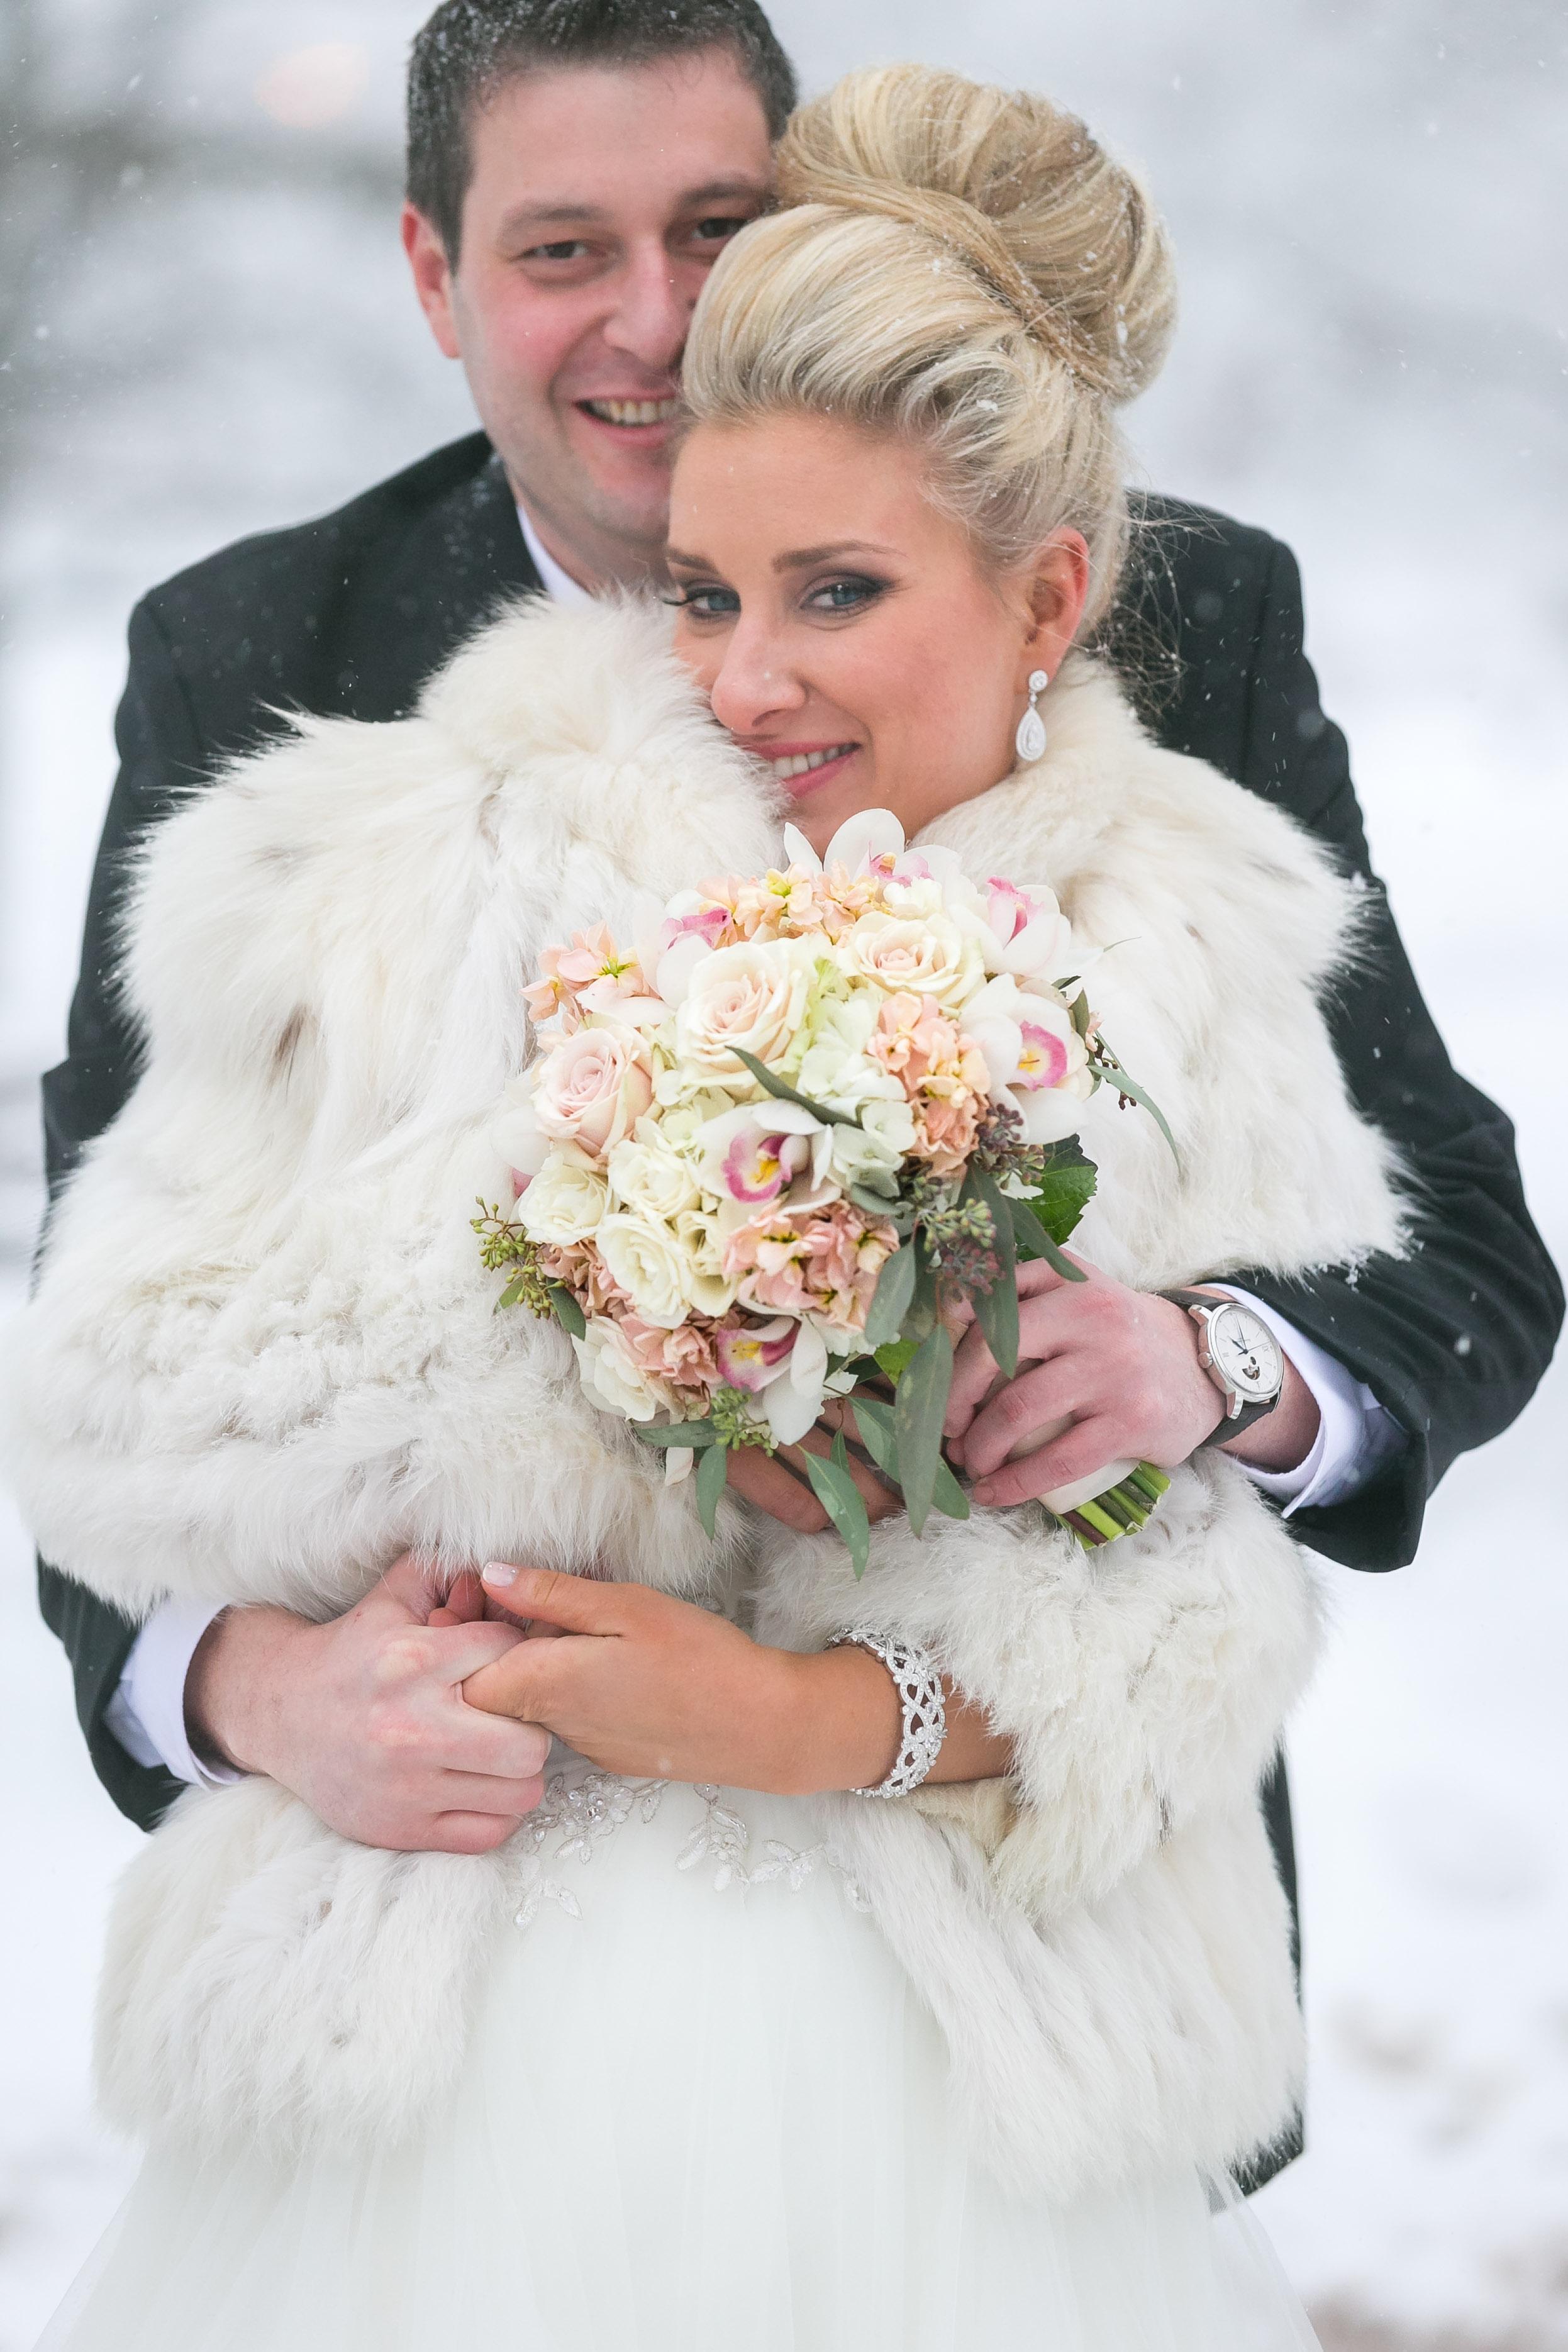 Elegant-Jewish-Wedding-The-Society-Room-of-Hartford-CT-Creative-Wedding-Photography-4.jpg